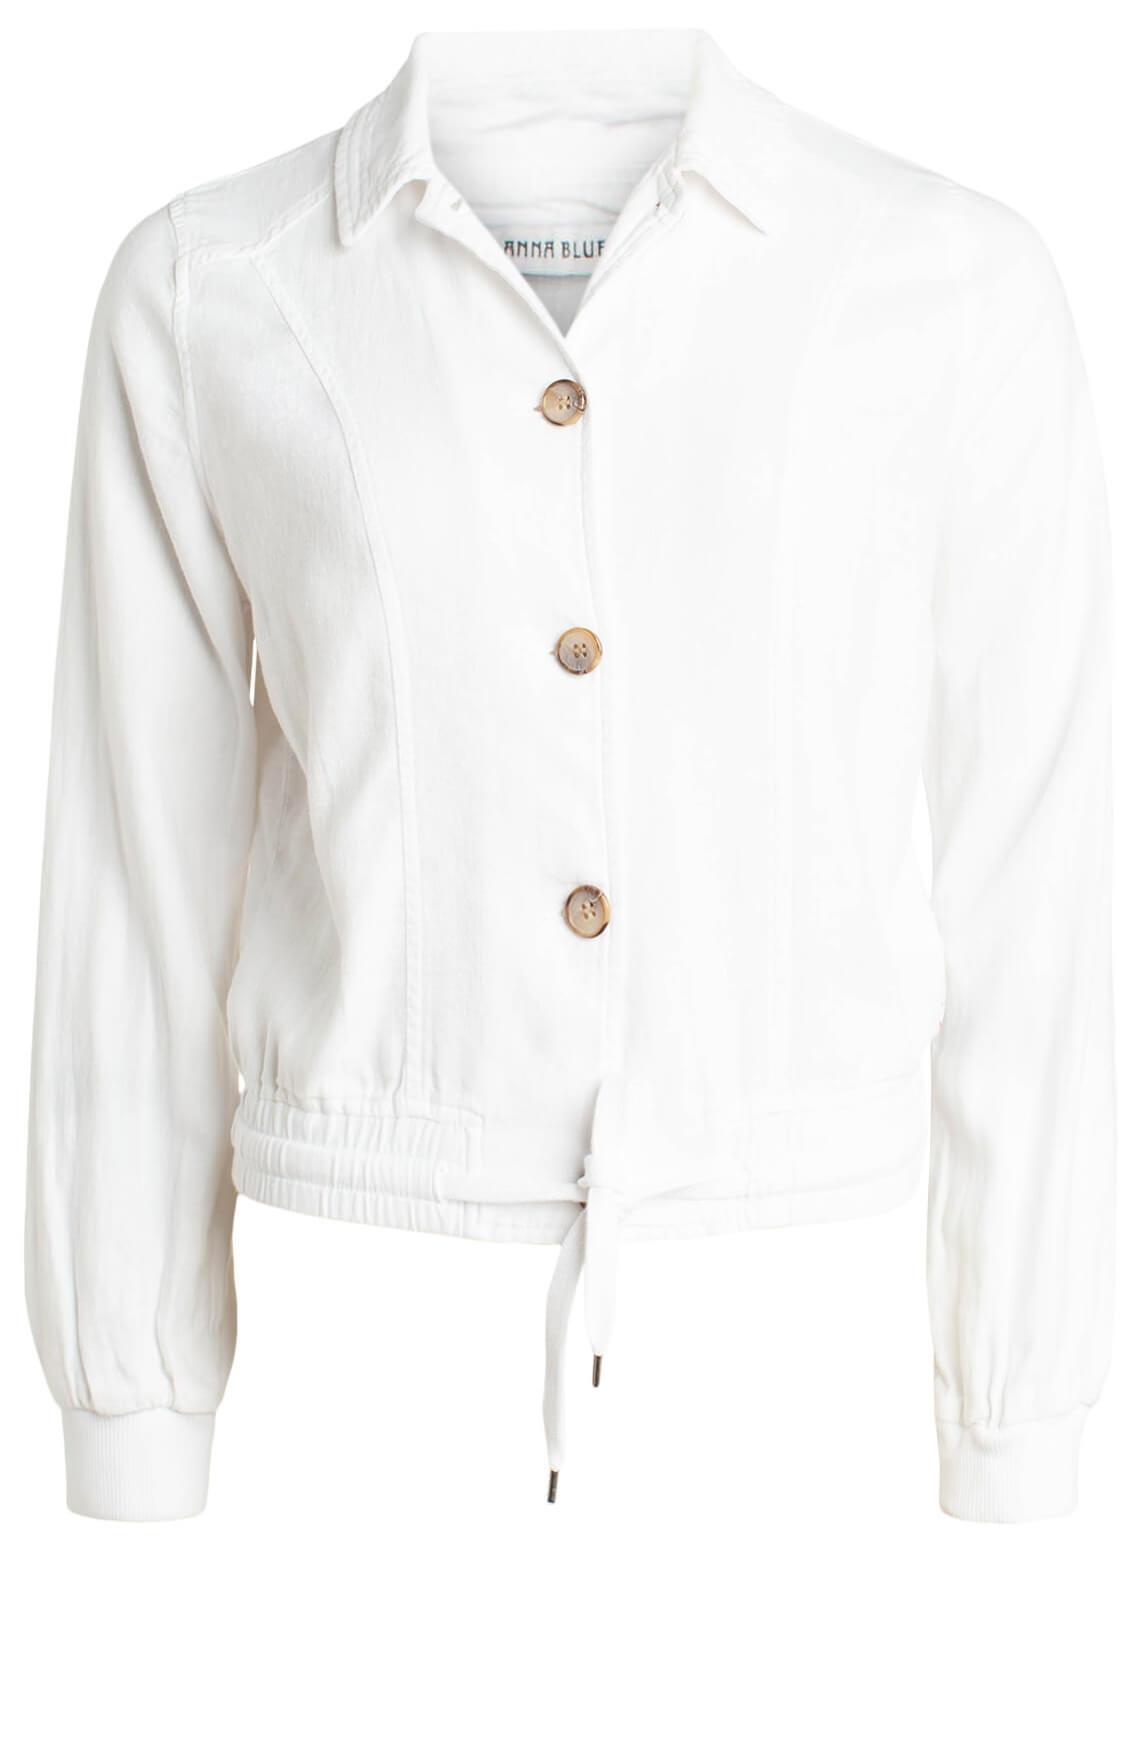 Anna Blue Dames Jack met linnen wit